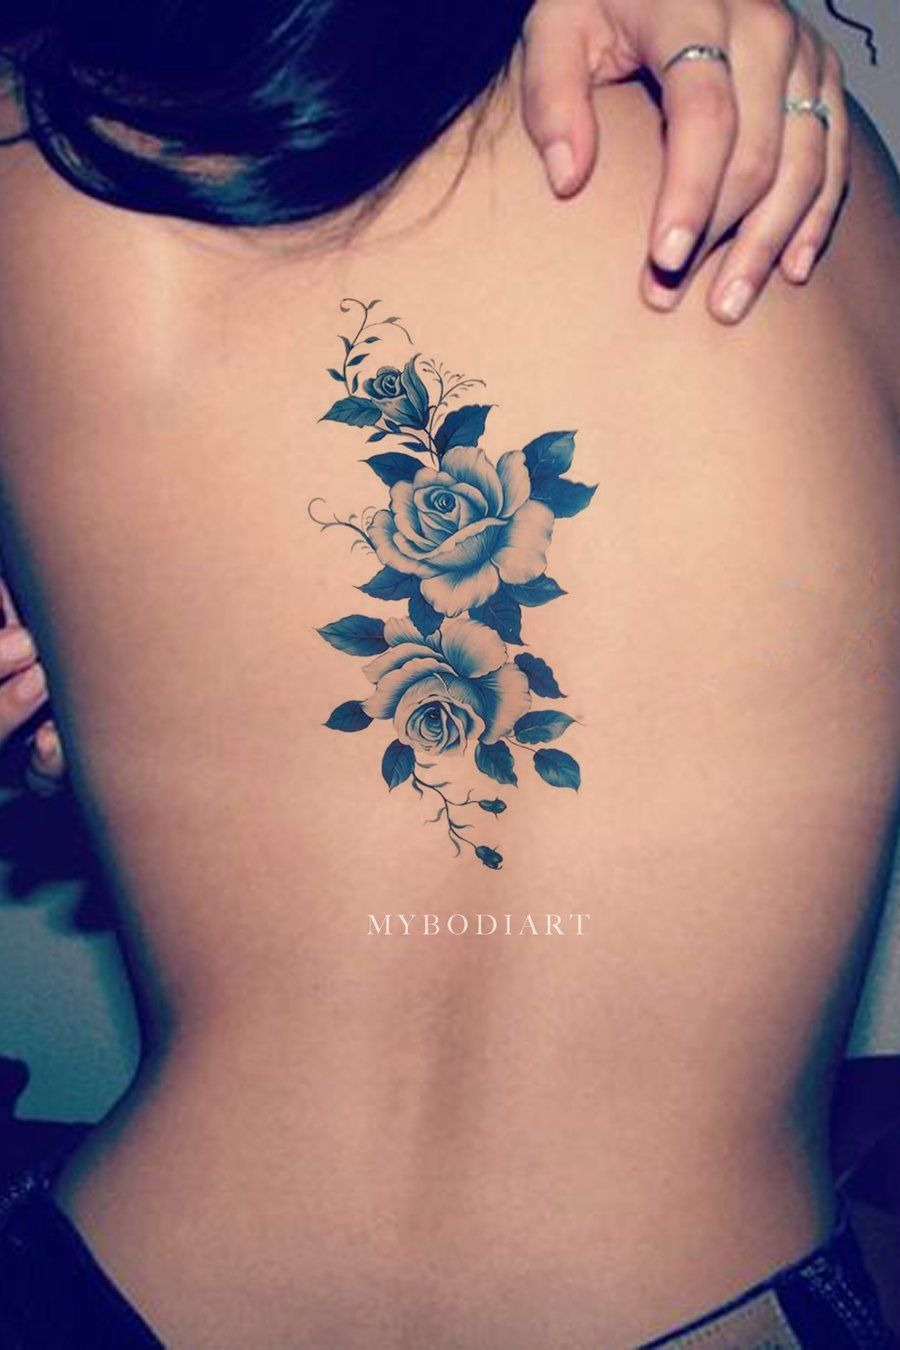 6 Sheets Wrist Body Art Henna Tattoo Stencil Flower: Elizabeth Blue Flower Temporary Tattoo